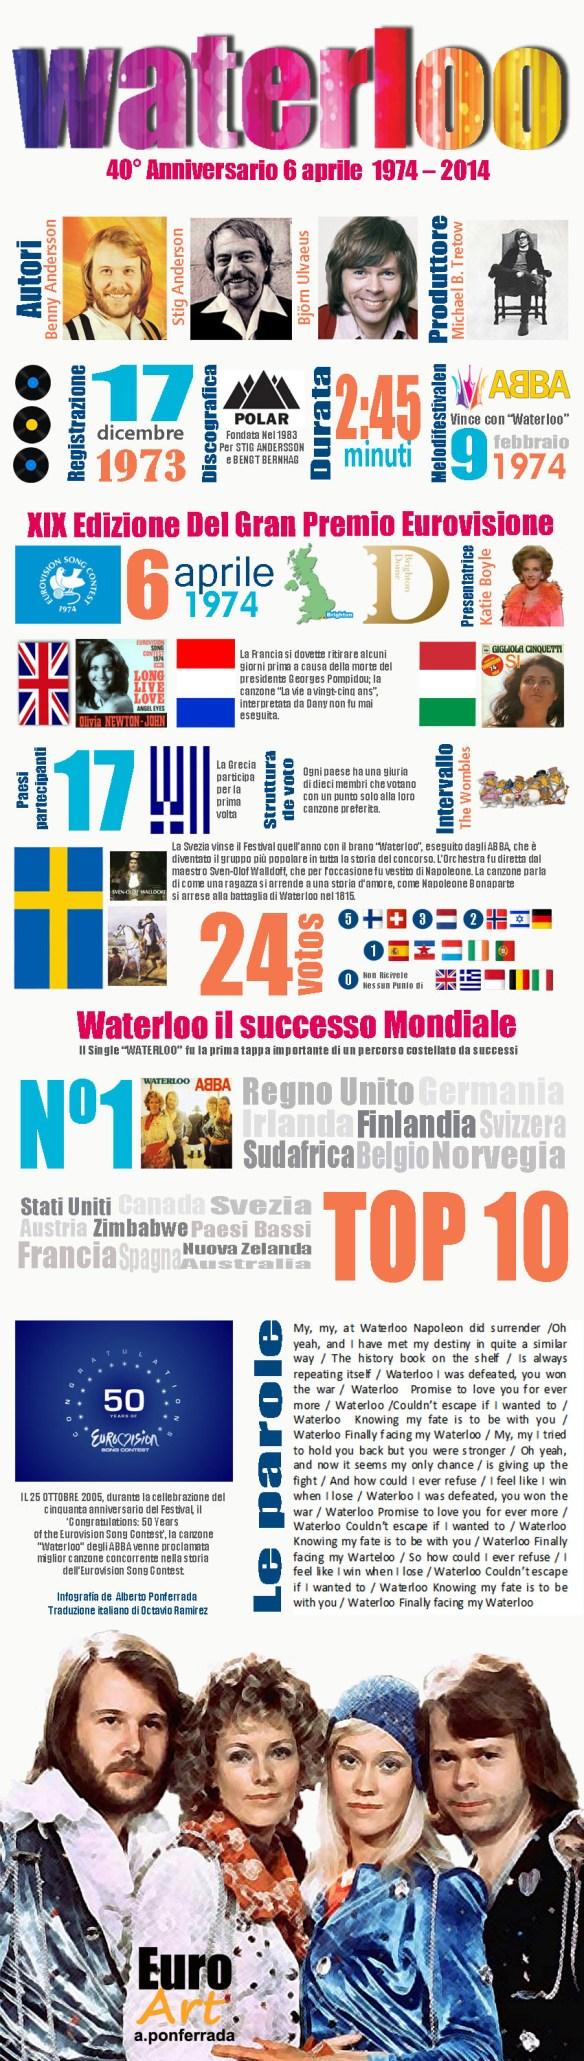 40 anniversario Waterloo (Italiano)